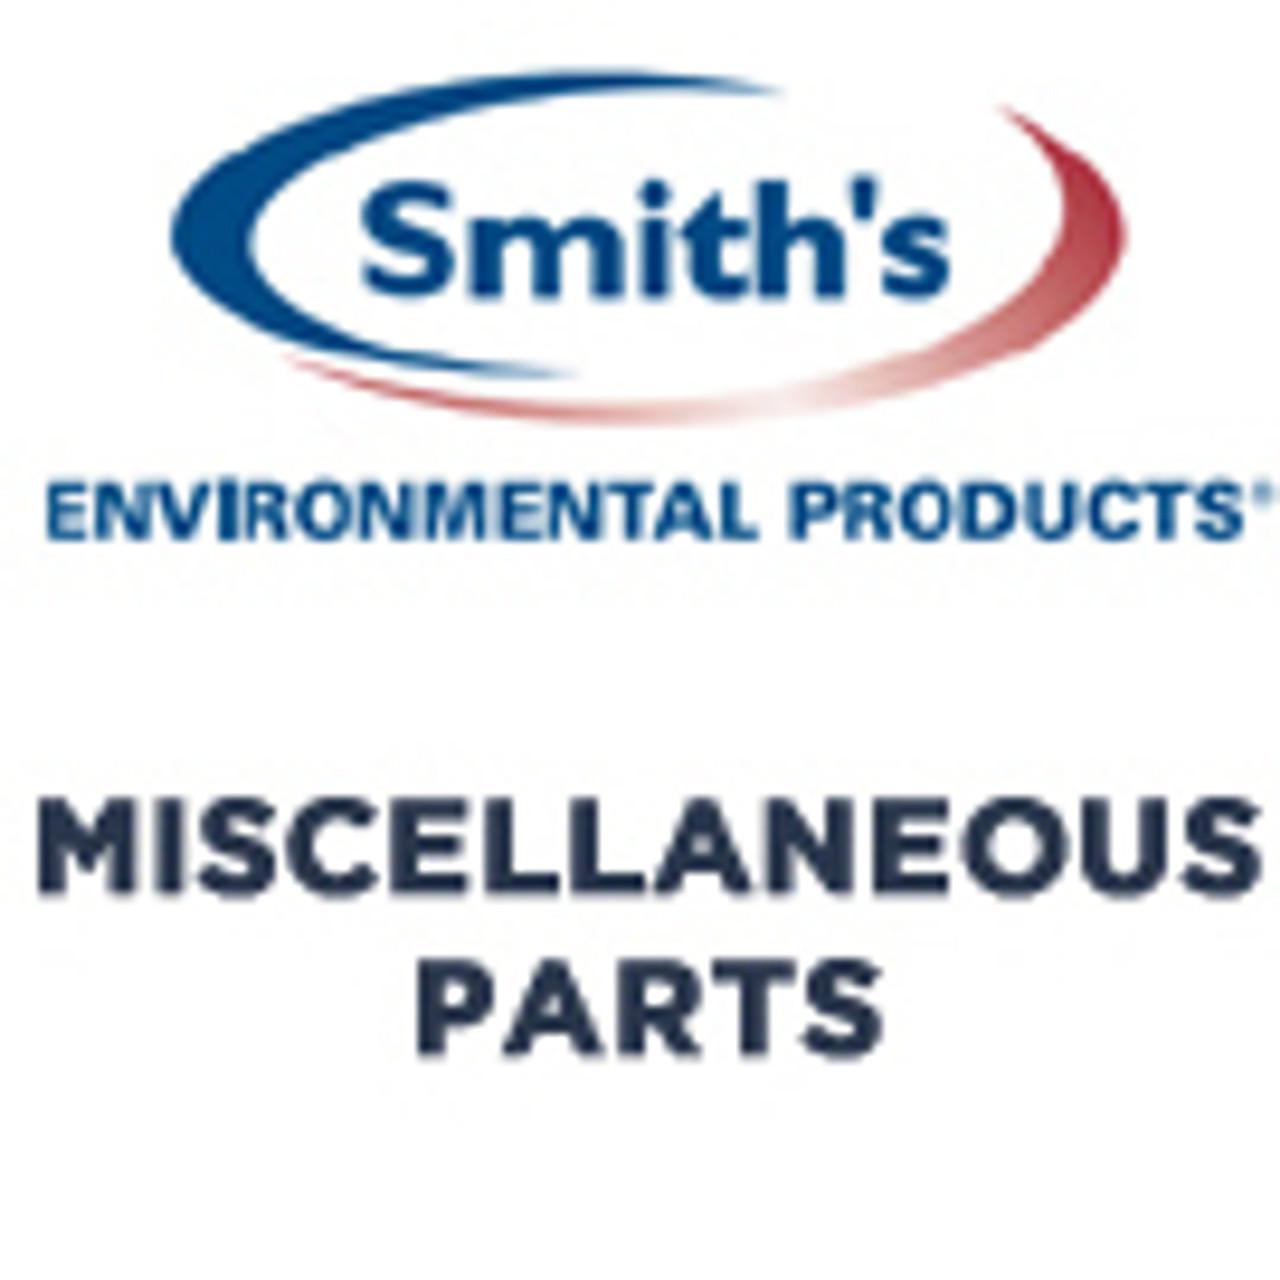 Smiths Environmental Miscellaneous Parts